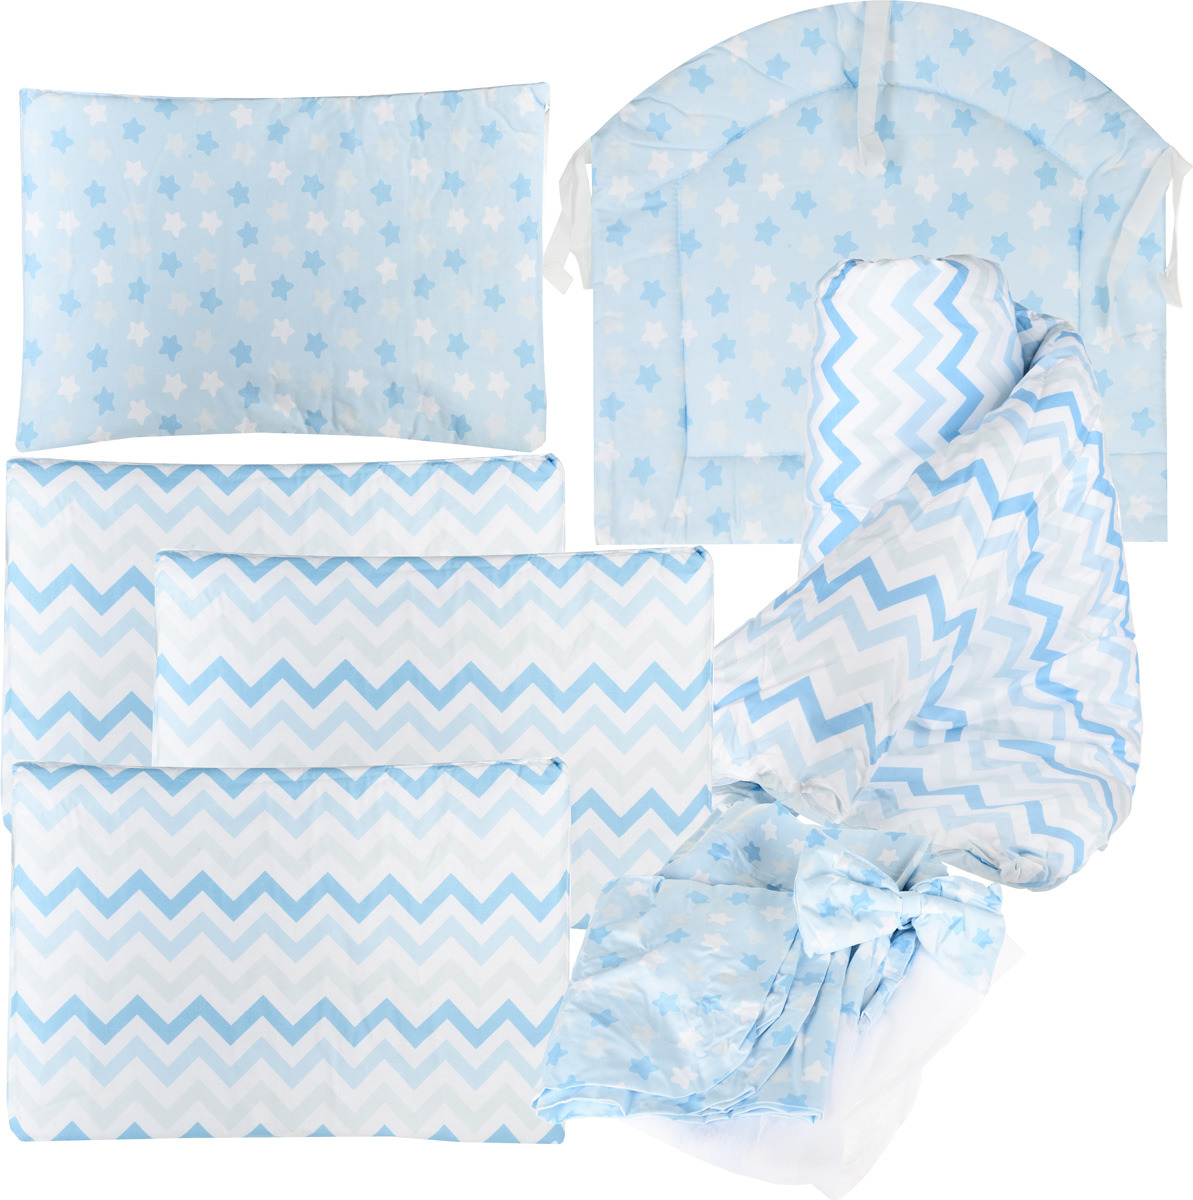 Комплект в кроватку Sweet Baby Stelle, 410682, голубой, 7 предметов цена